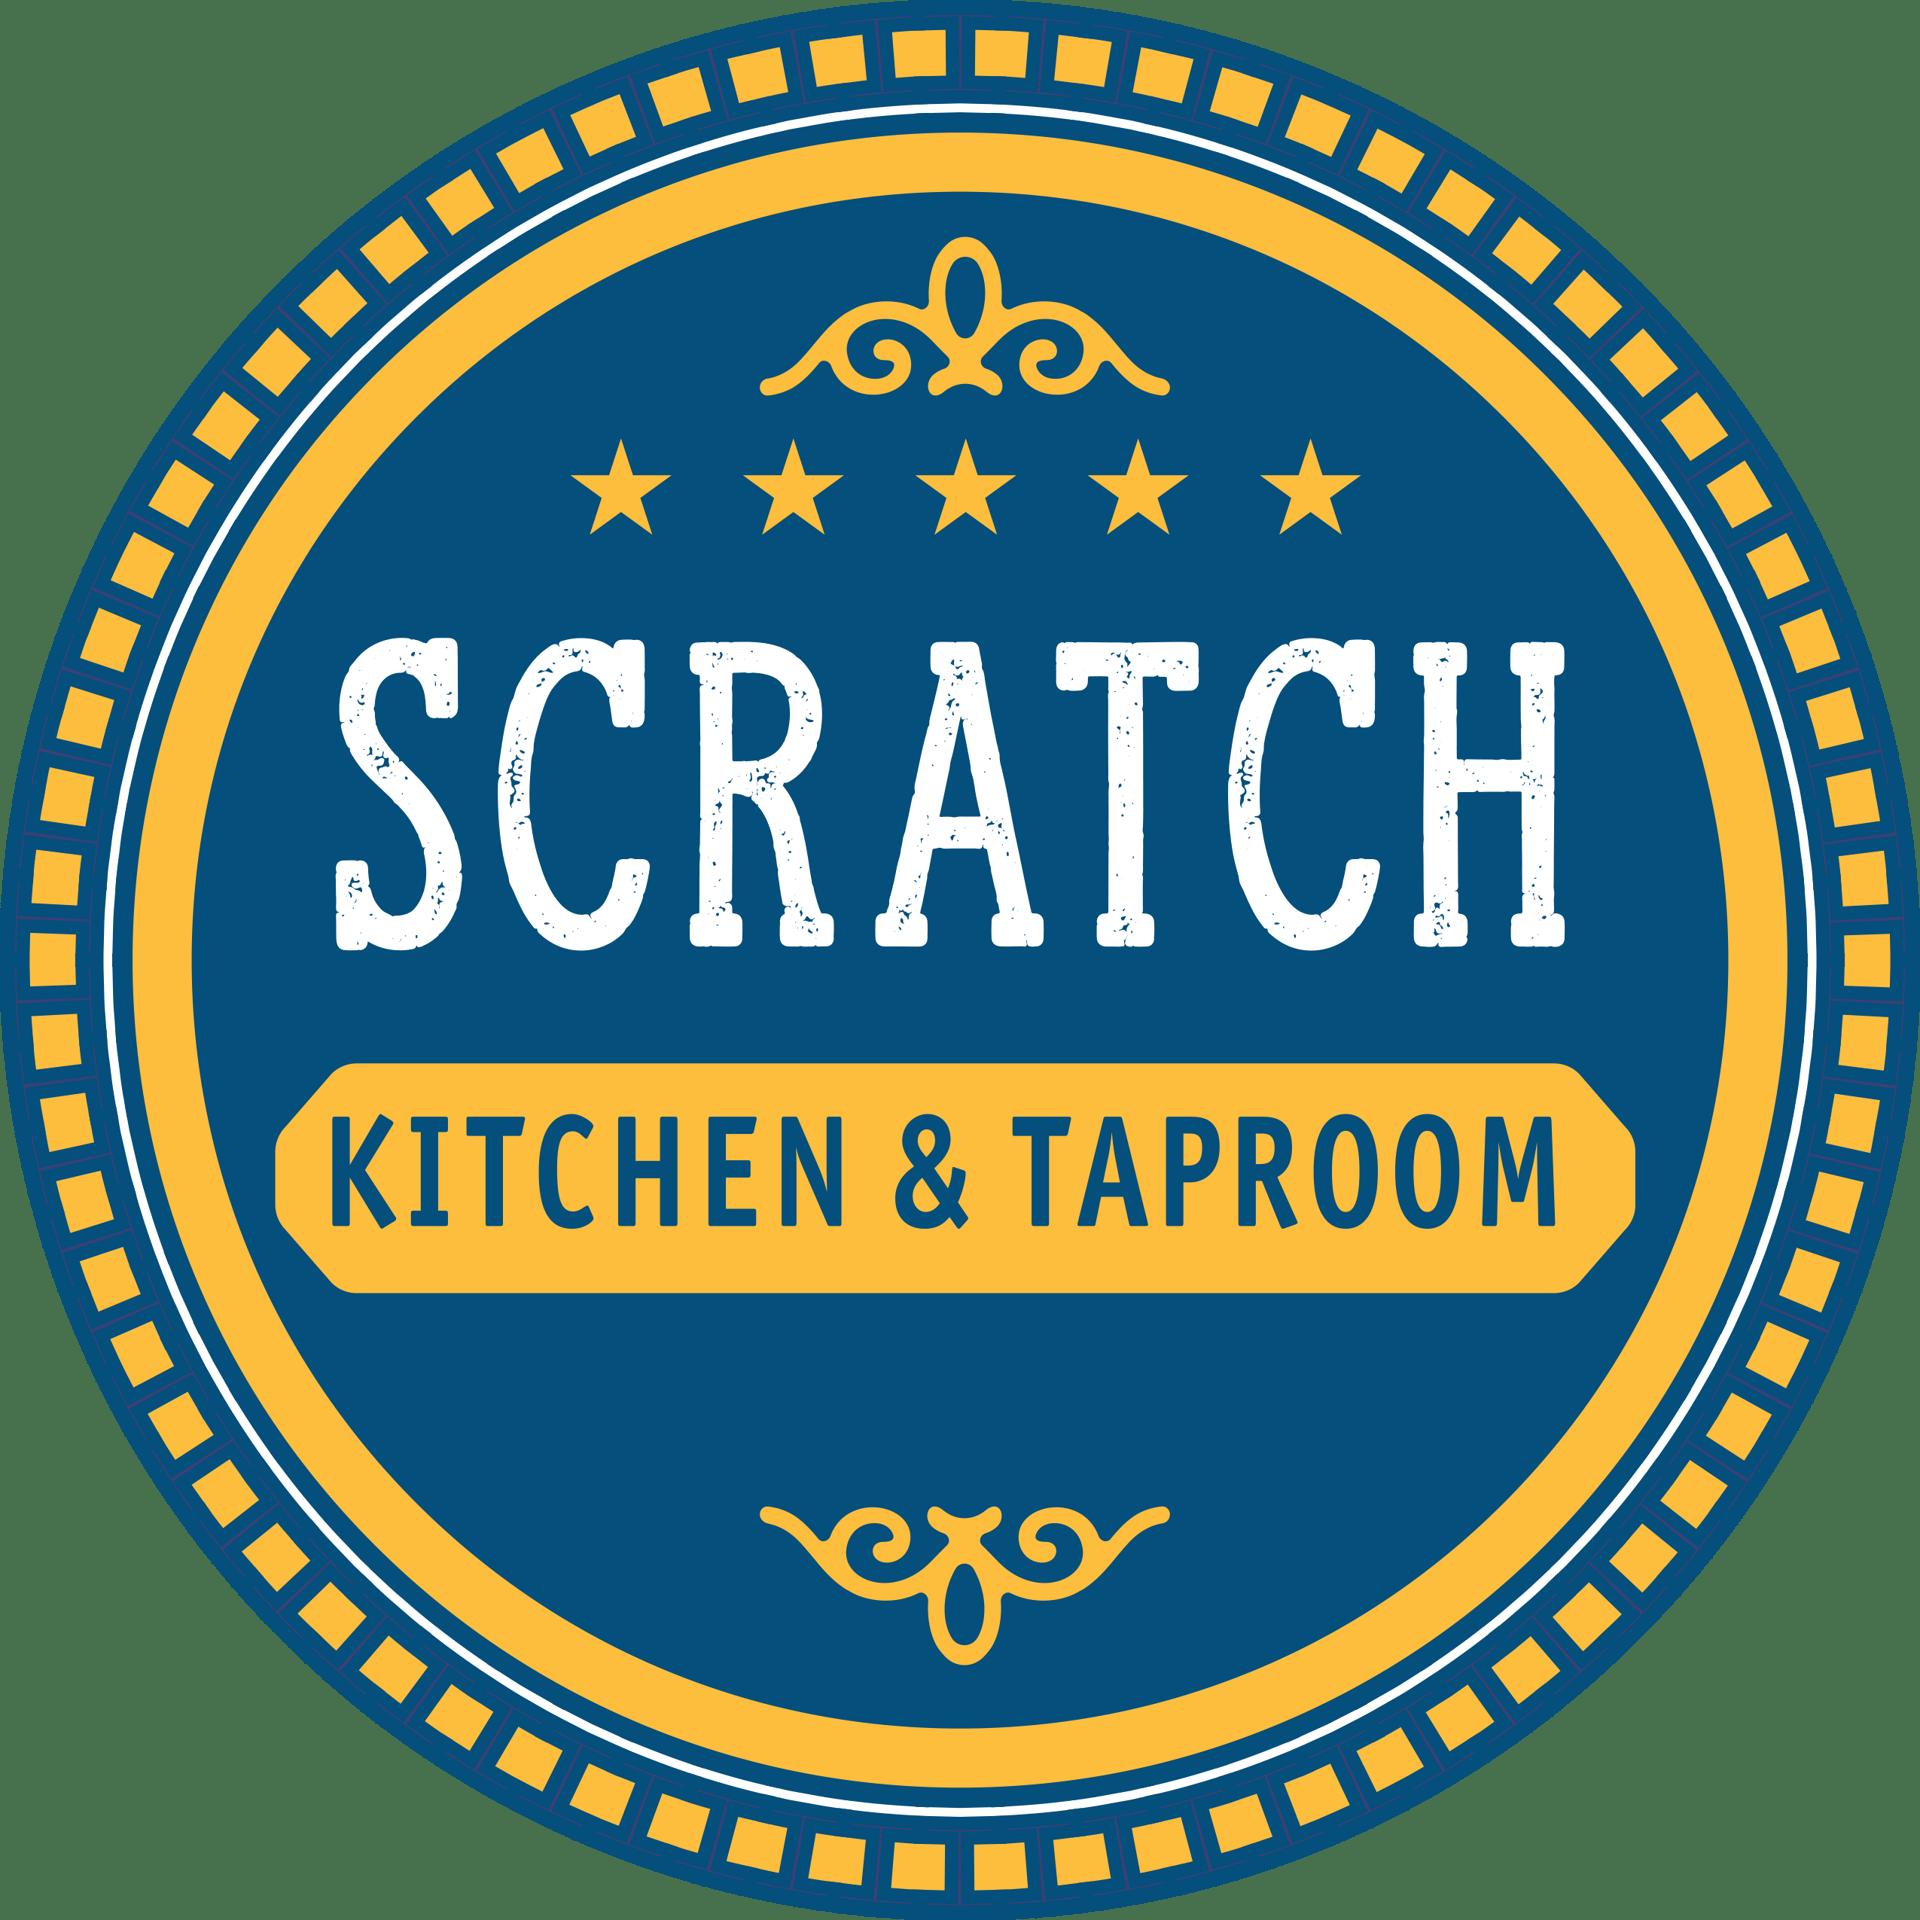 Scratch Kitchen & Taproom